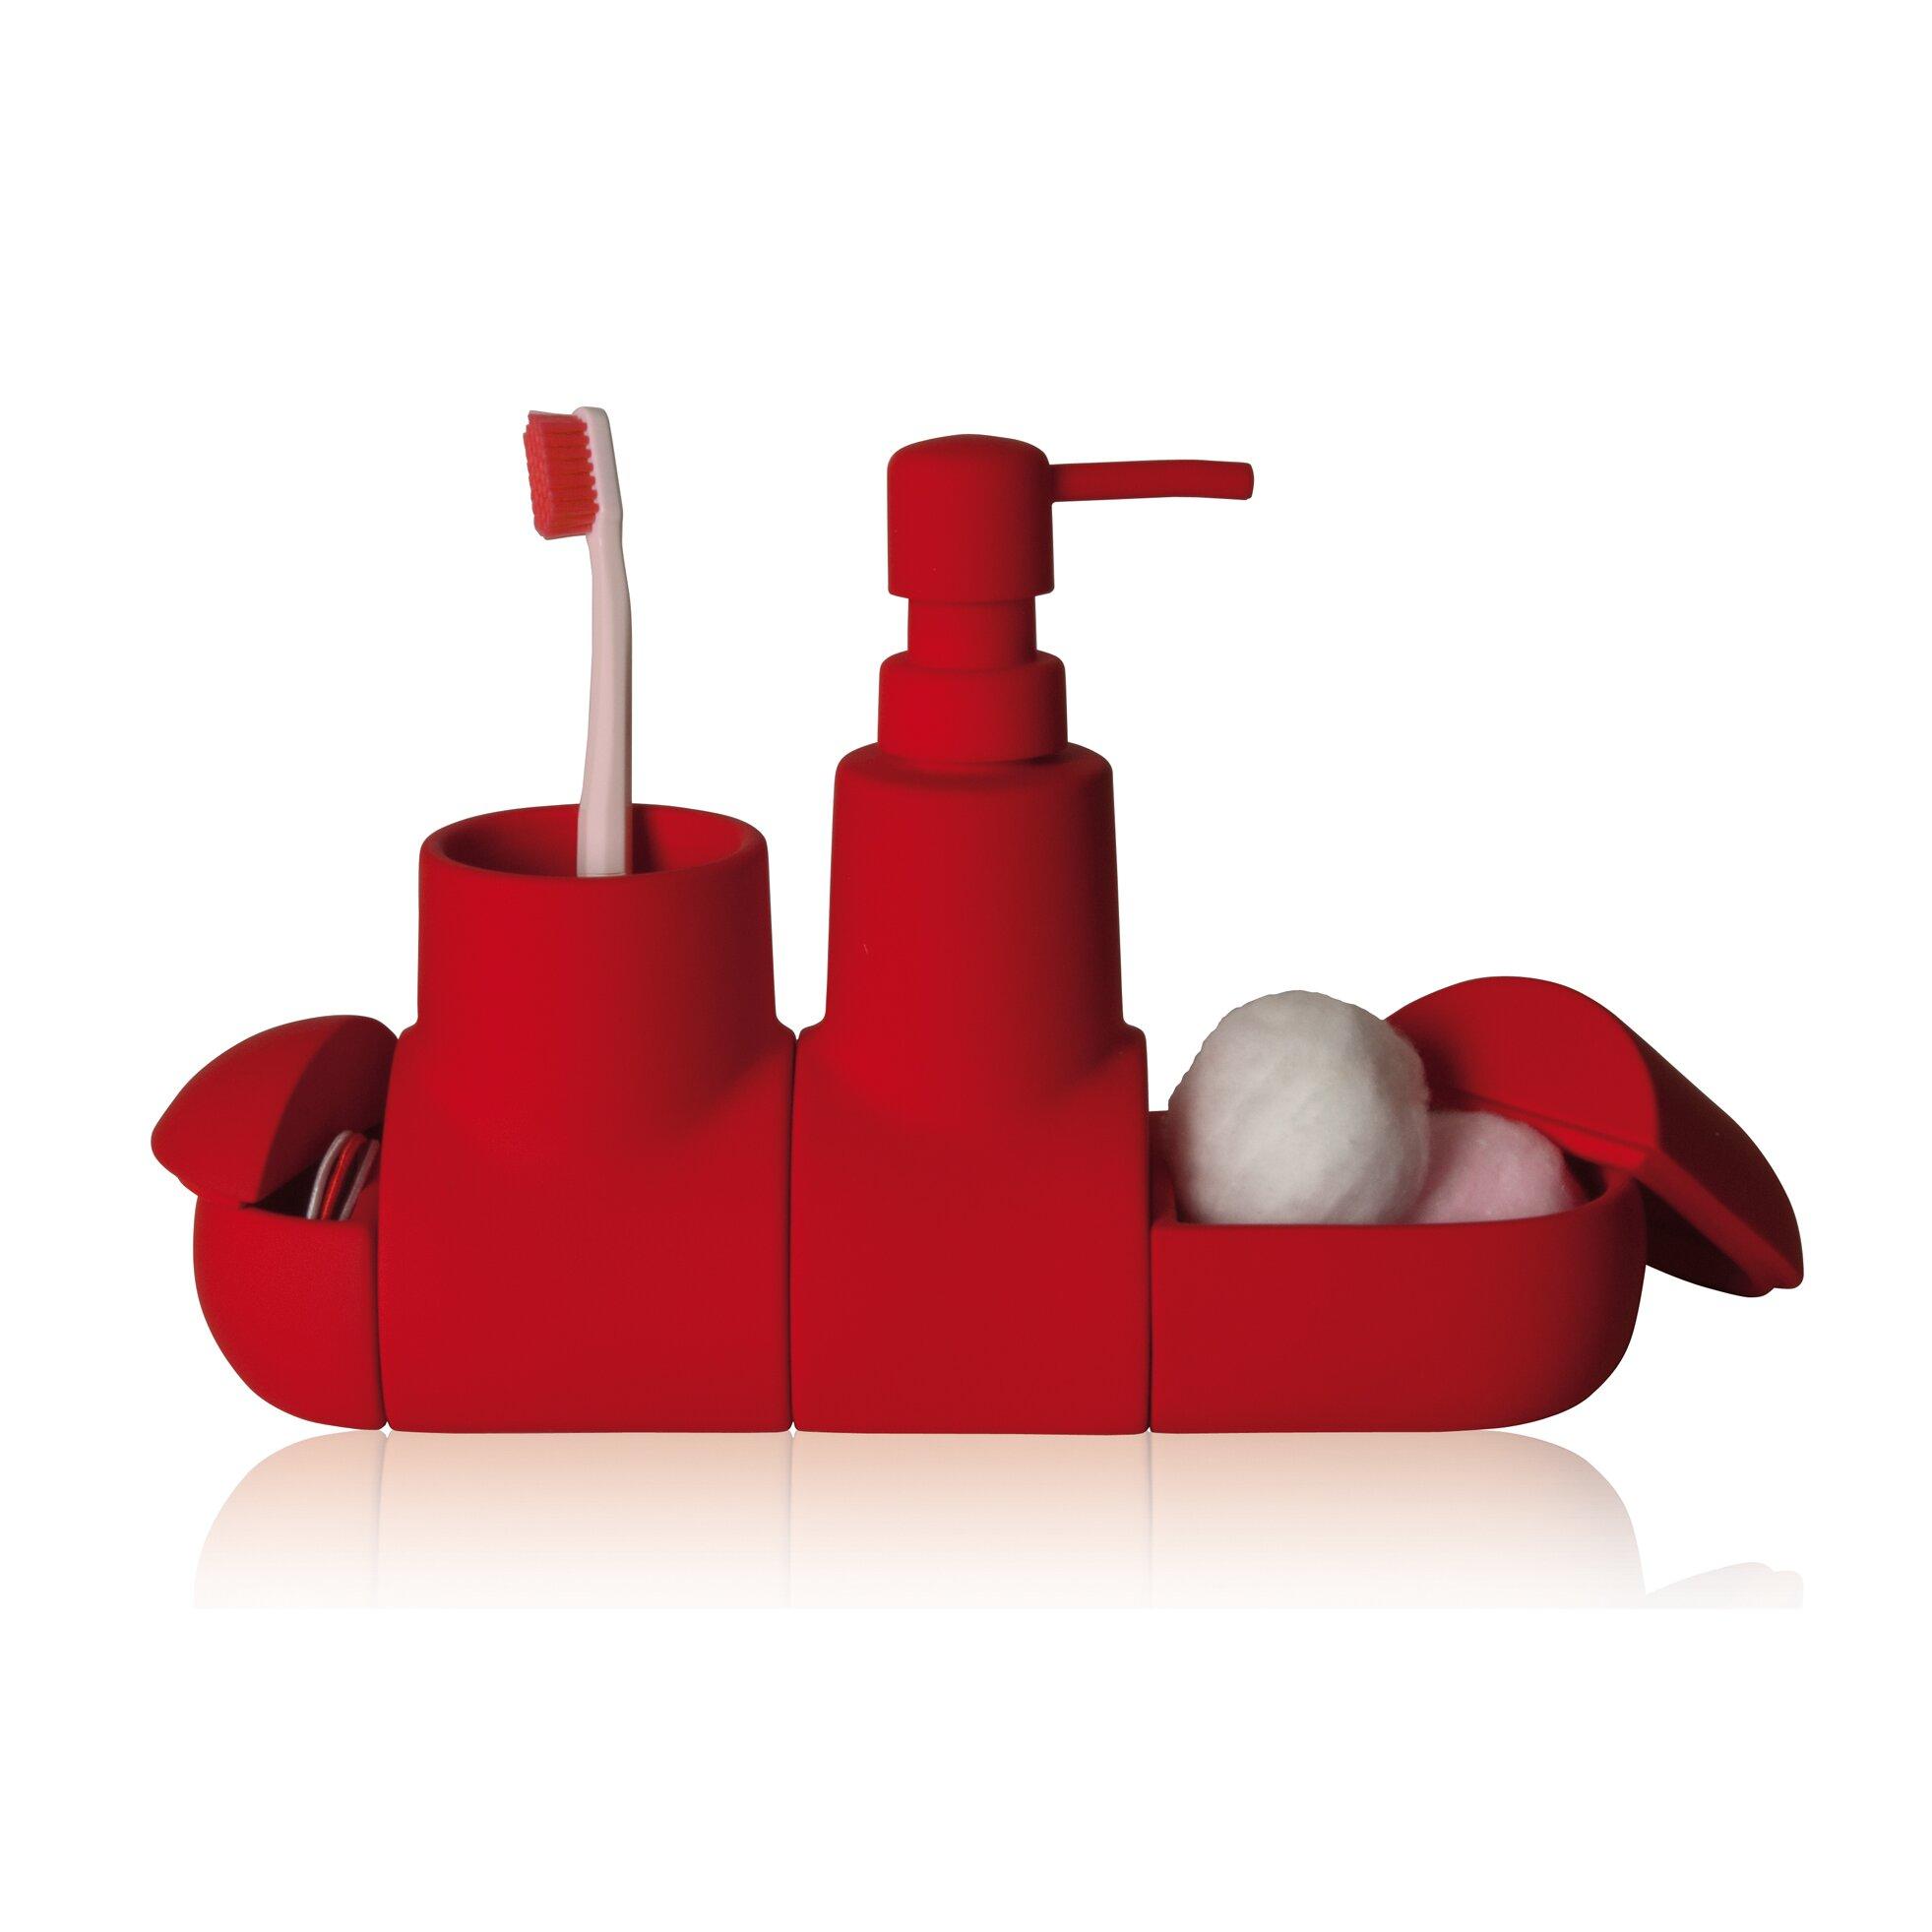 seletti submarino porcelain bathroom accessory set. Black Bedroom Furniture Sets. Home Design Ideas